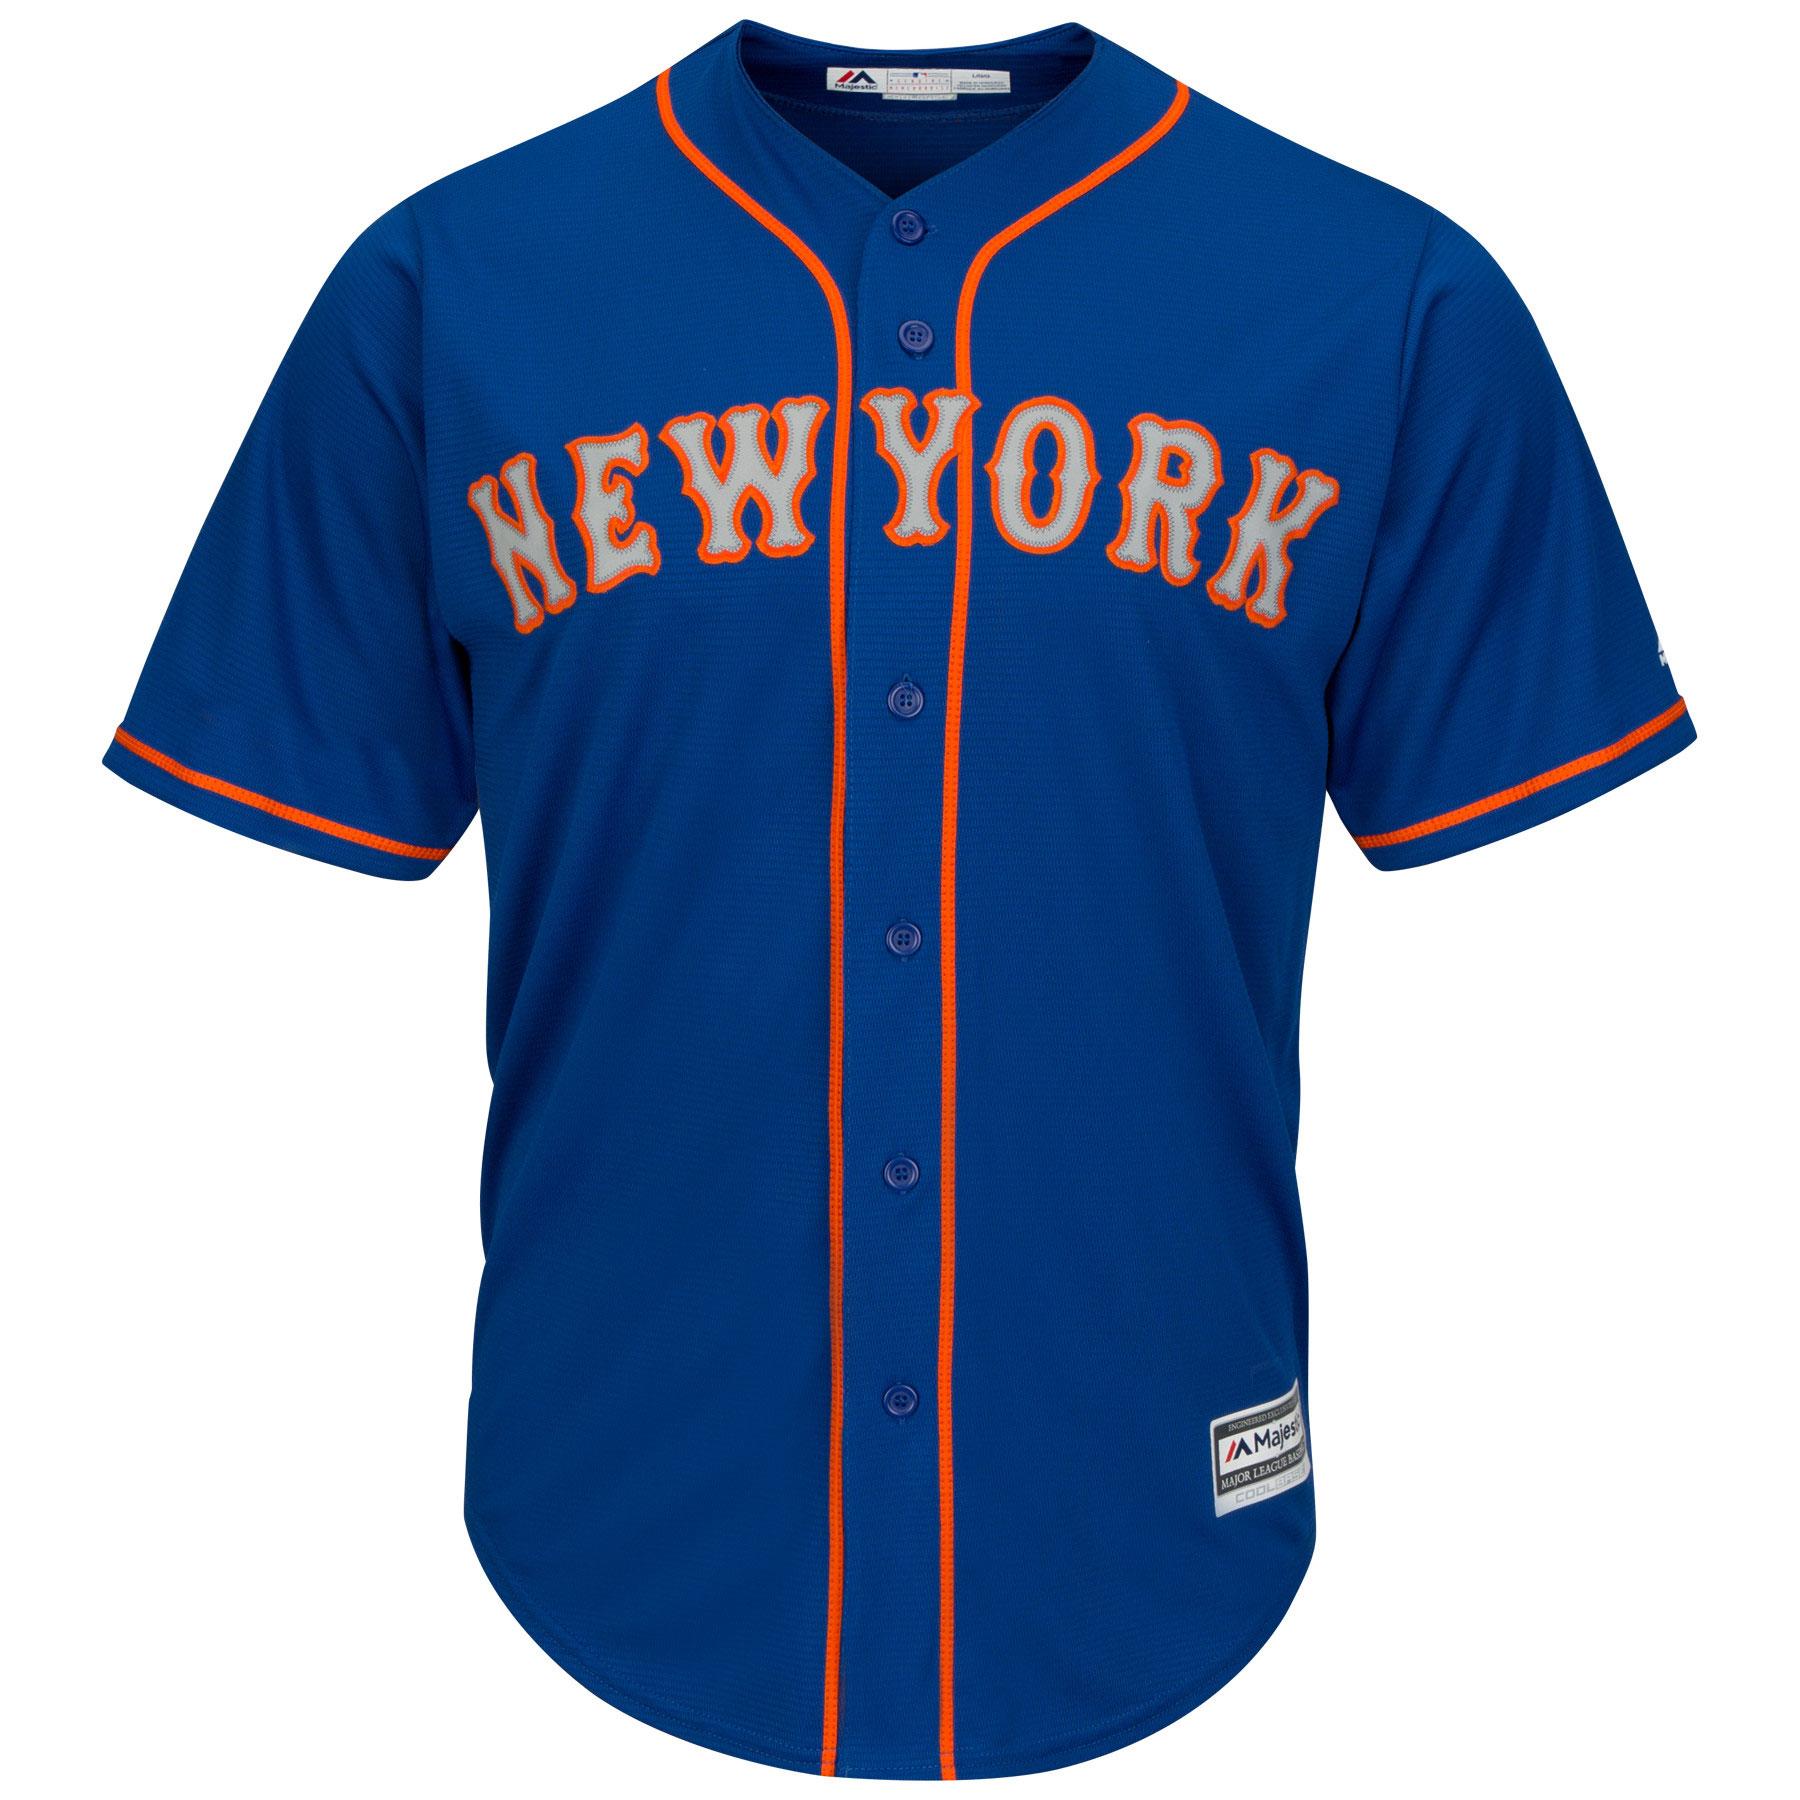 New York Mets 2015 Cool Base Replica Alternate Road Mlb Baseball 1800x1800